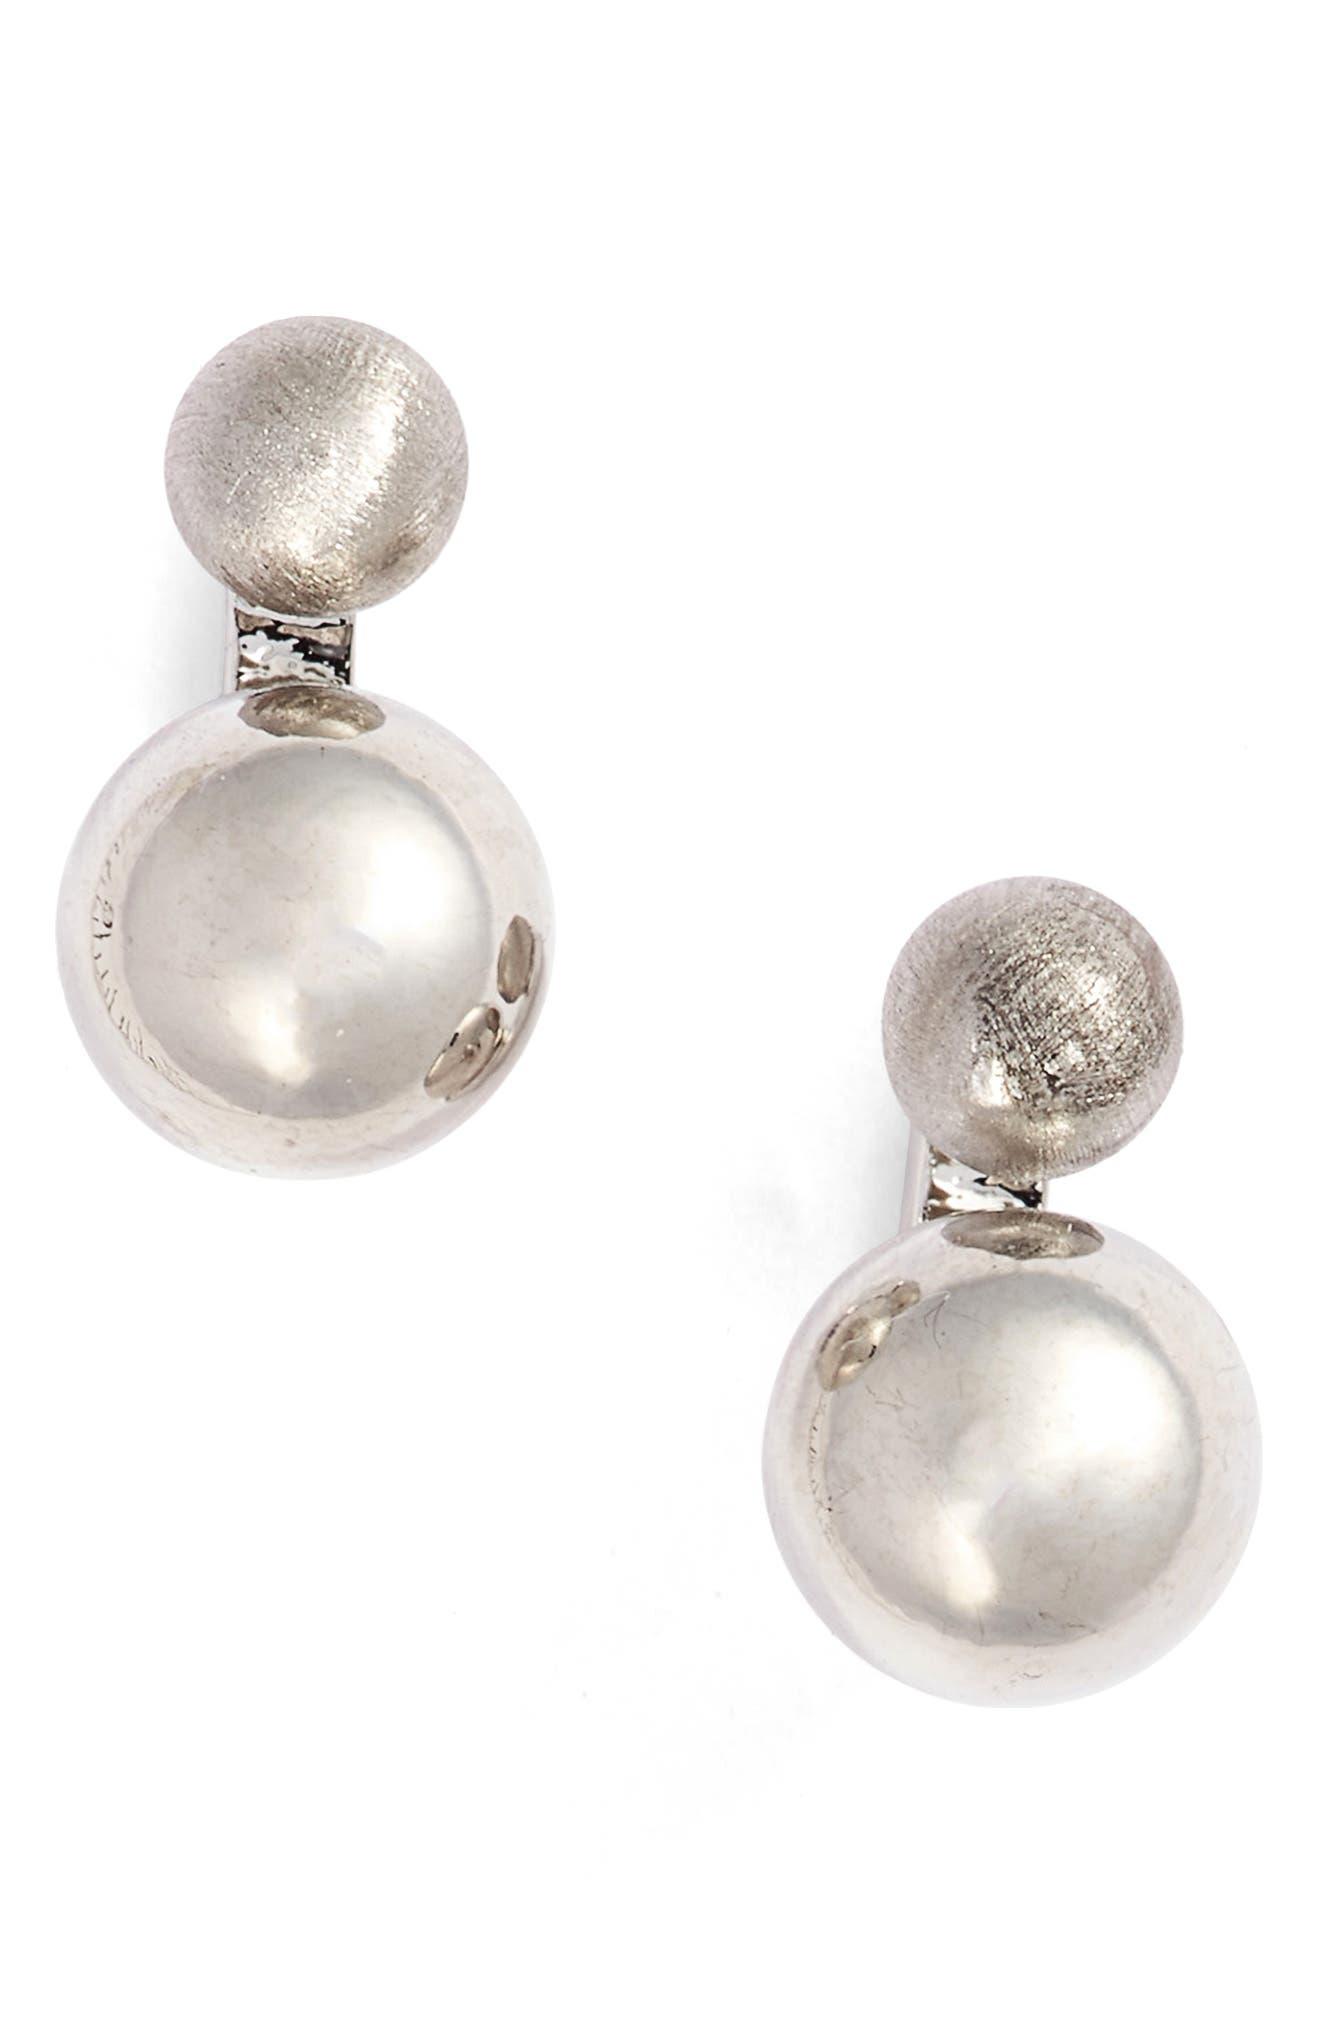 Double Sphere Stud Earrings,                             Main thumbnail 1, color,                             040